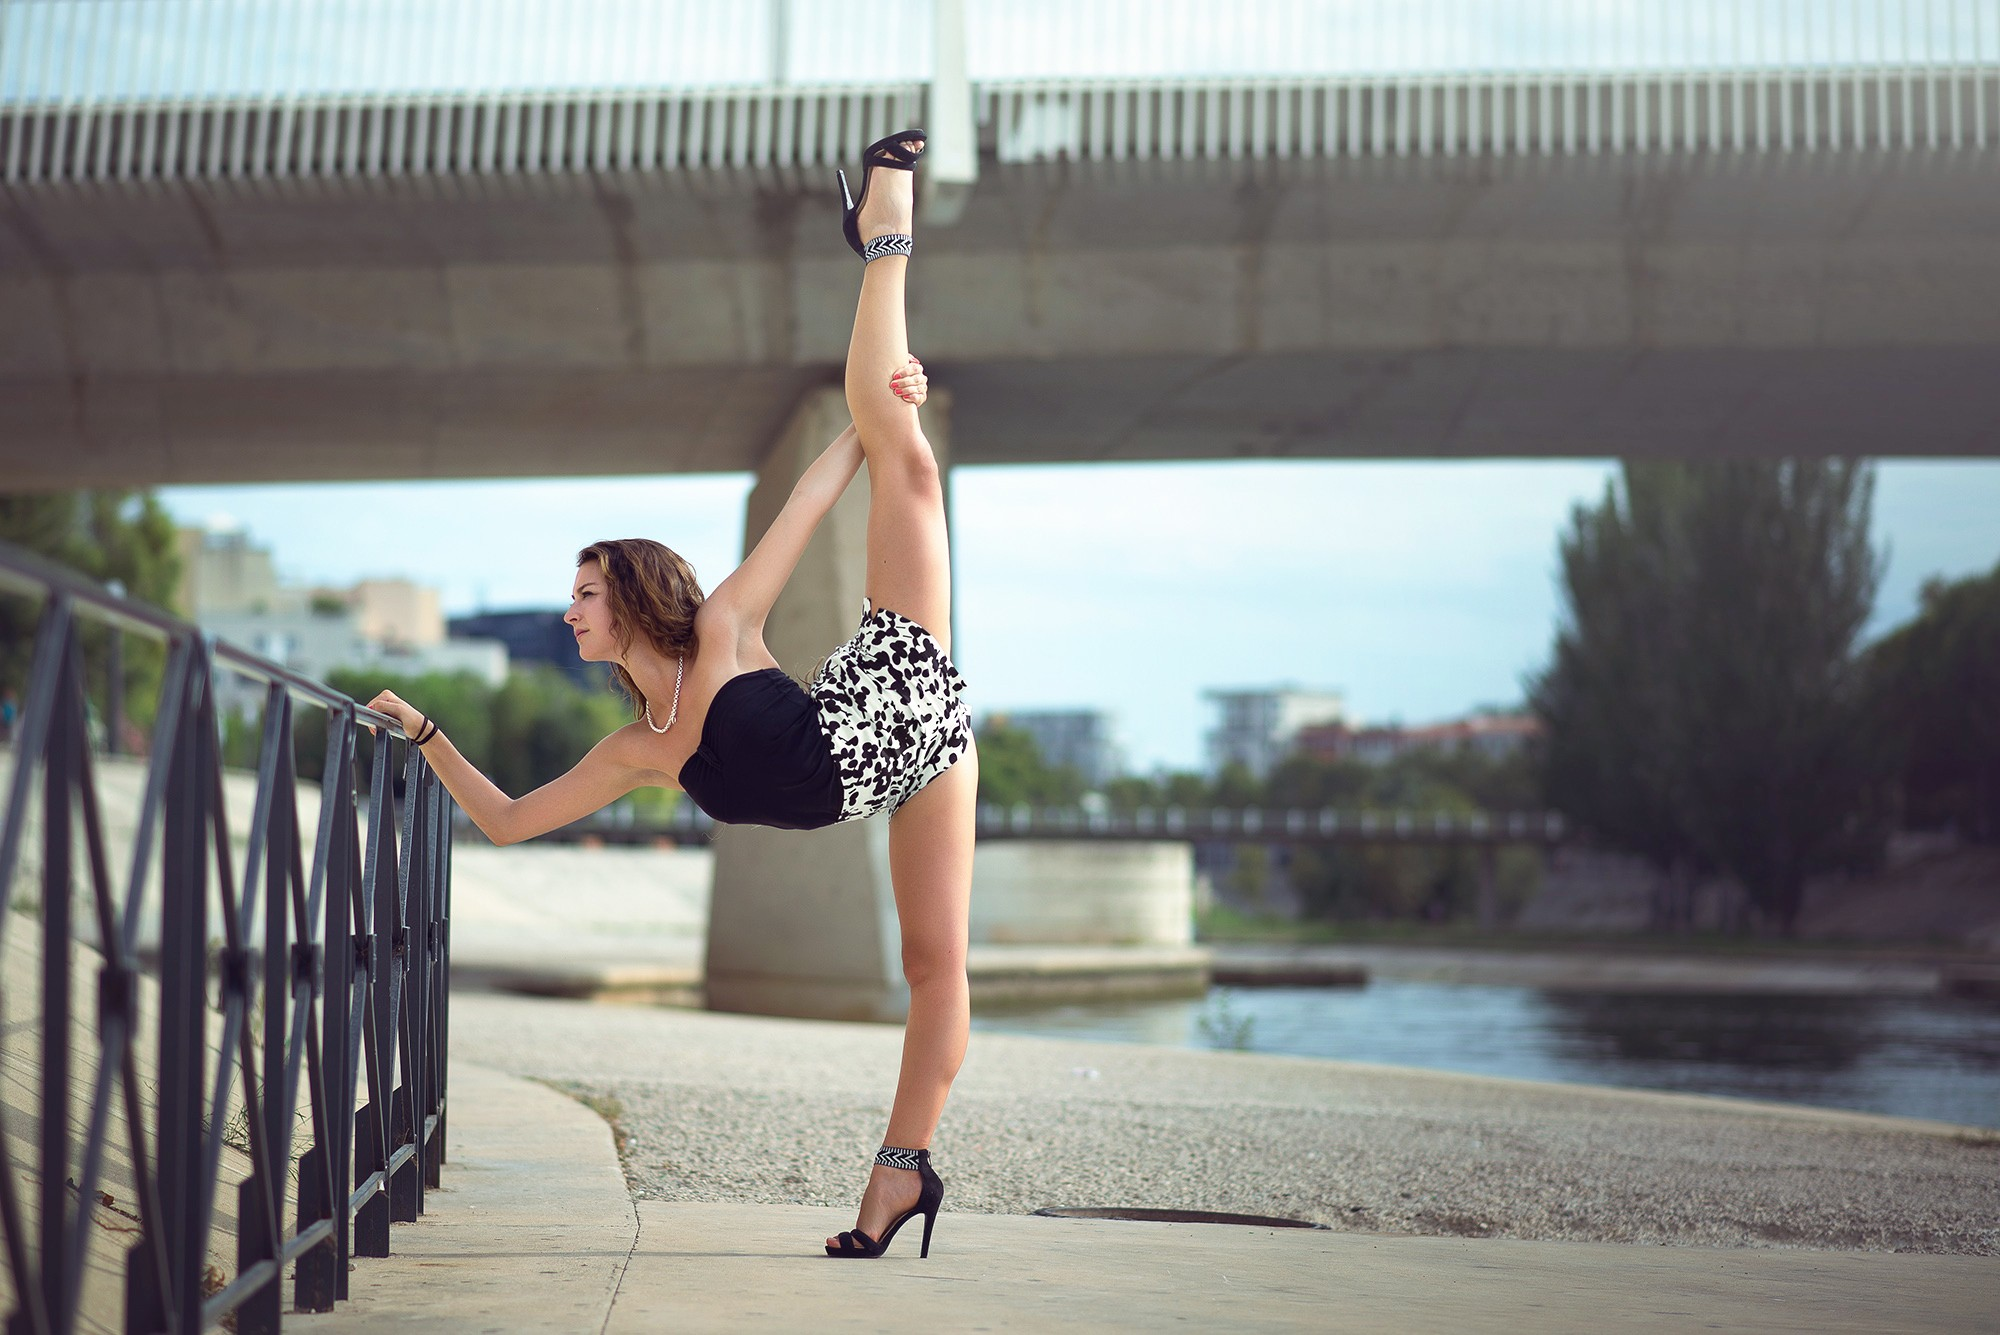 Lovely Girl Wallpaper Download Gymnastics Hd Backgrounds Pixelstalk Net